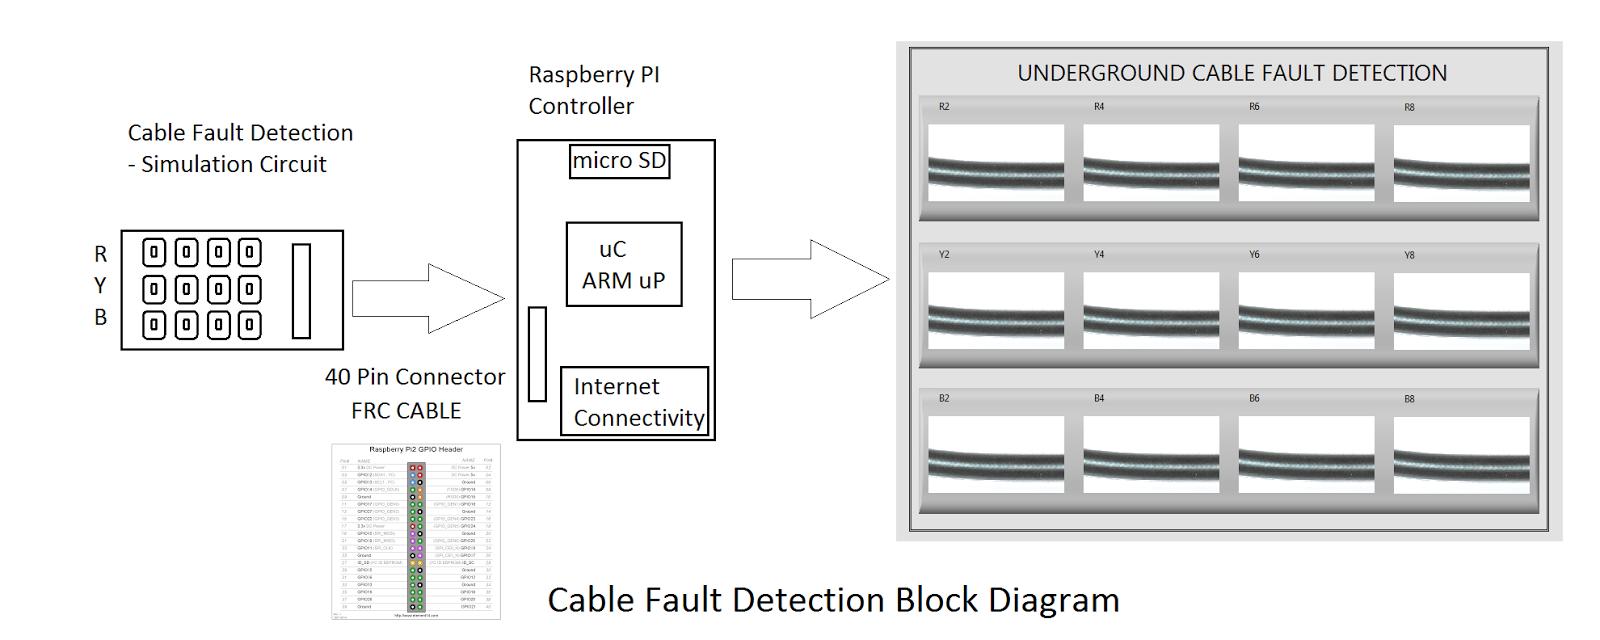 medium resolution of keystone hideout wiring schematic keystone toy haulers mazda b2000 engine diagram email routing diagram